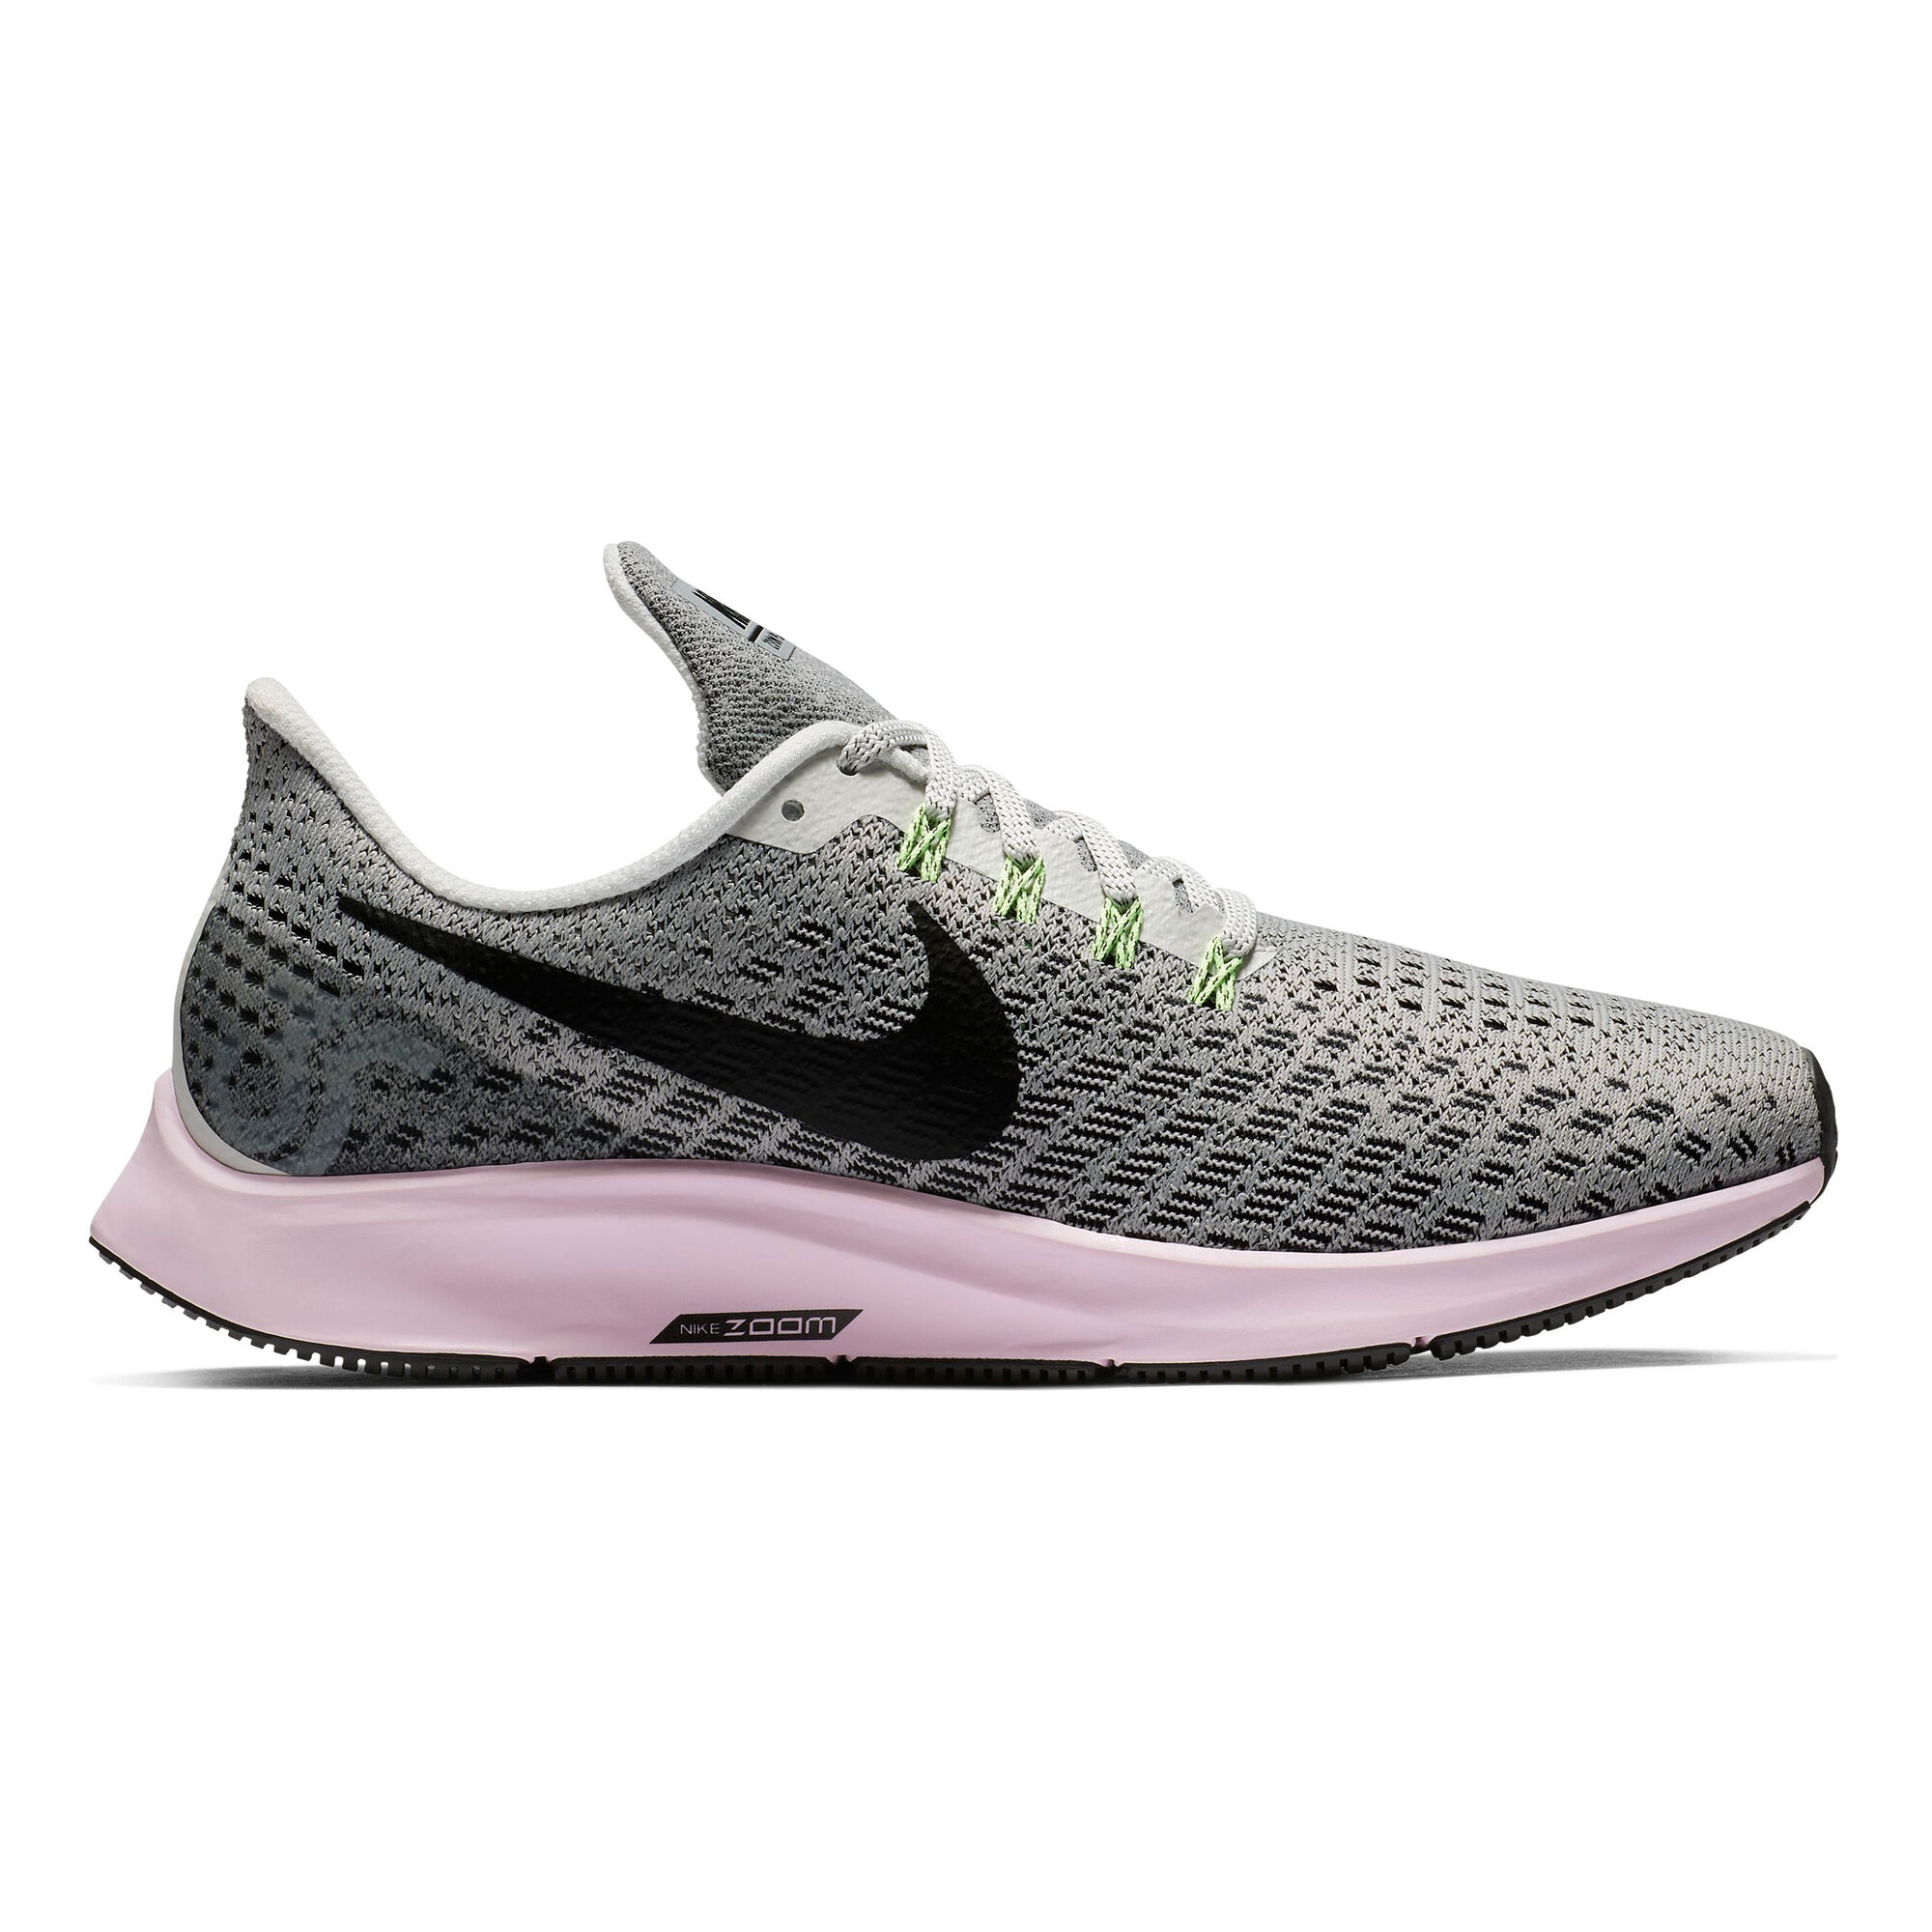 6da05a8d1cfabc Nike · Nike · Nike · Nike · Nike · Nike · Nike · Nike · Nike · Nike. Air  Zoom Pegasus 35 ...